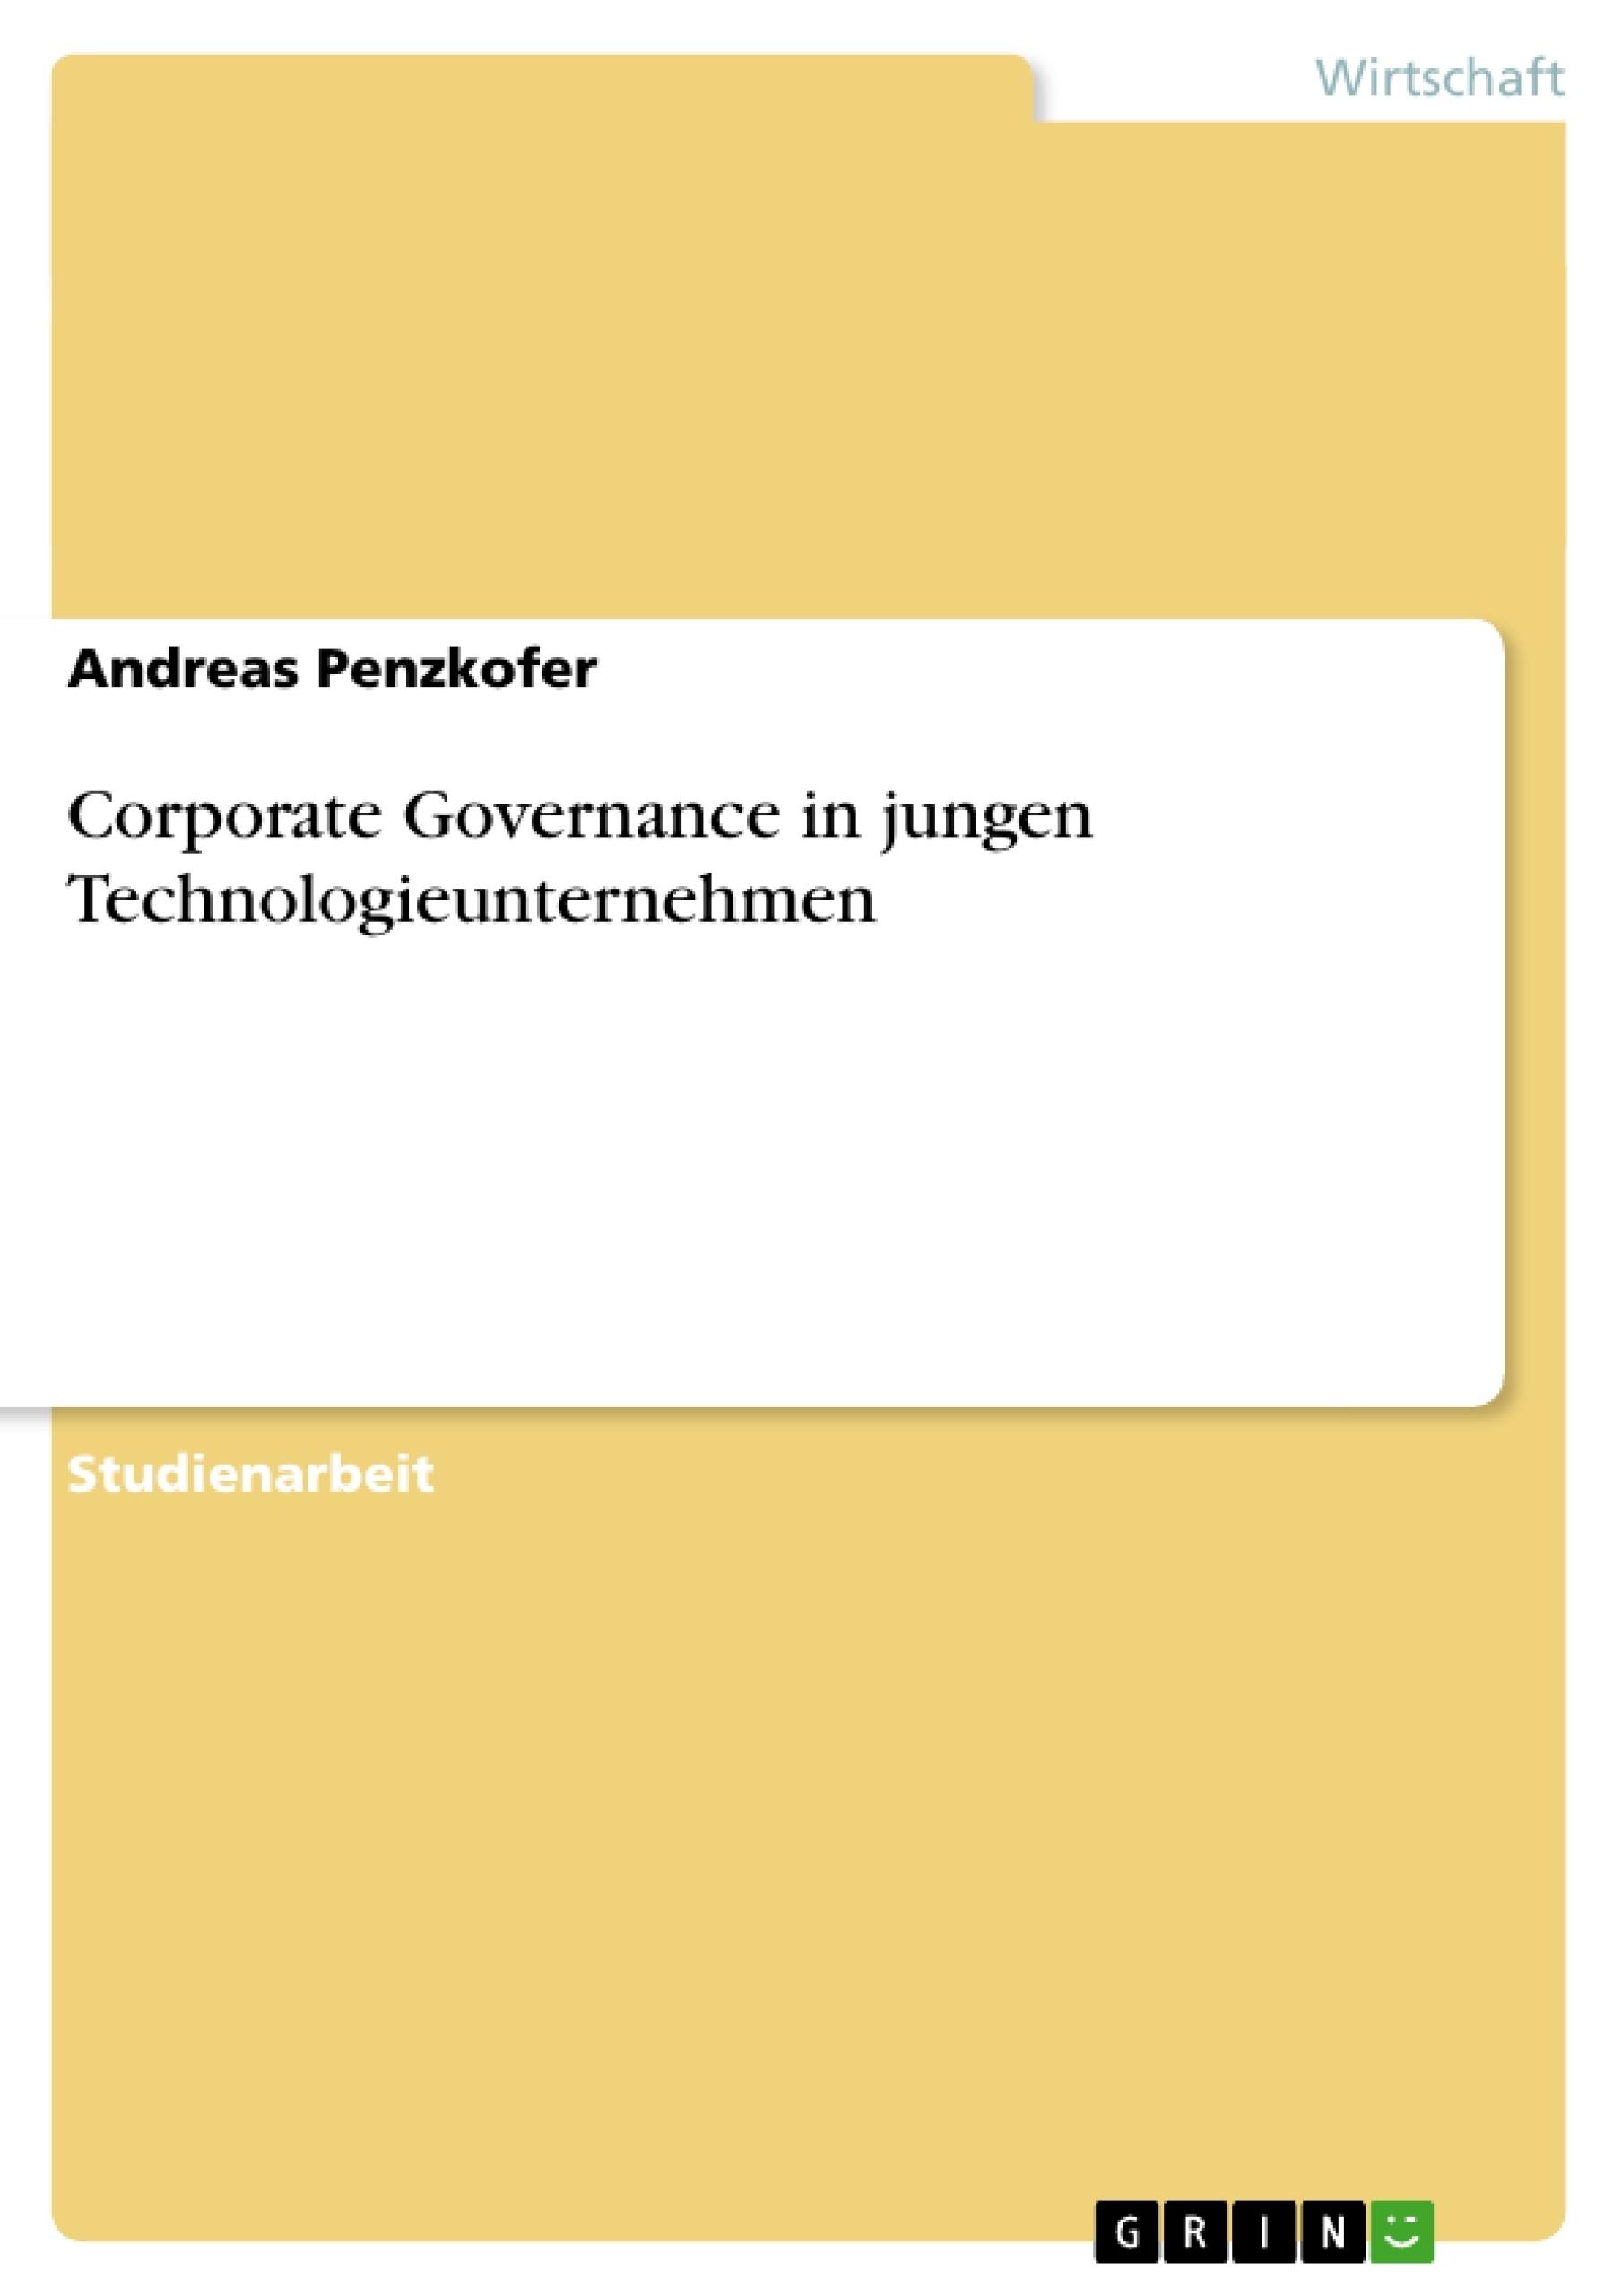 Titel: Corporate Governance in jungen Technologieunternehmen